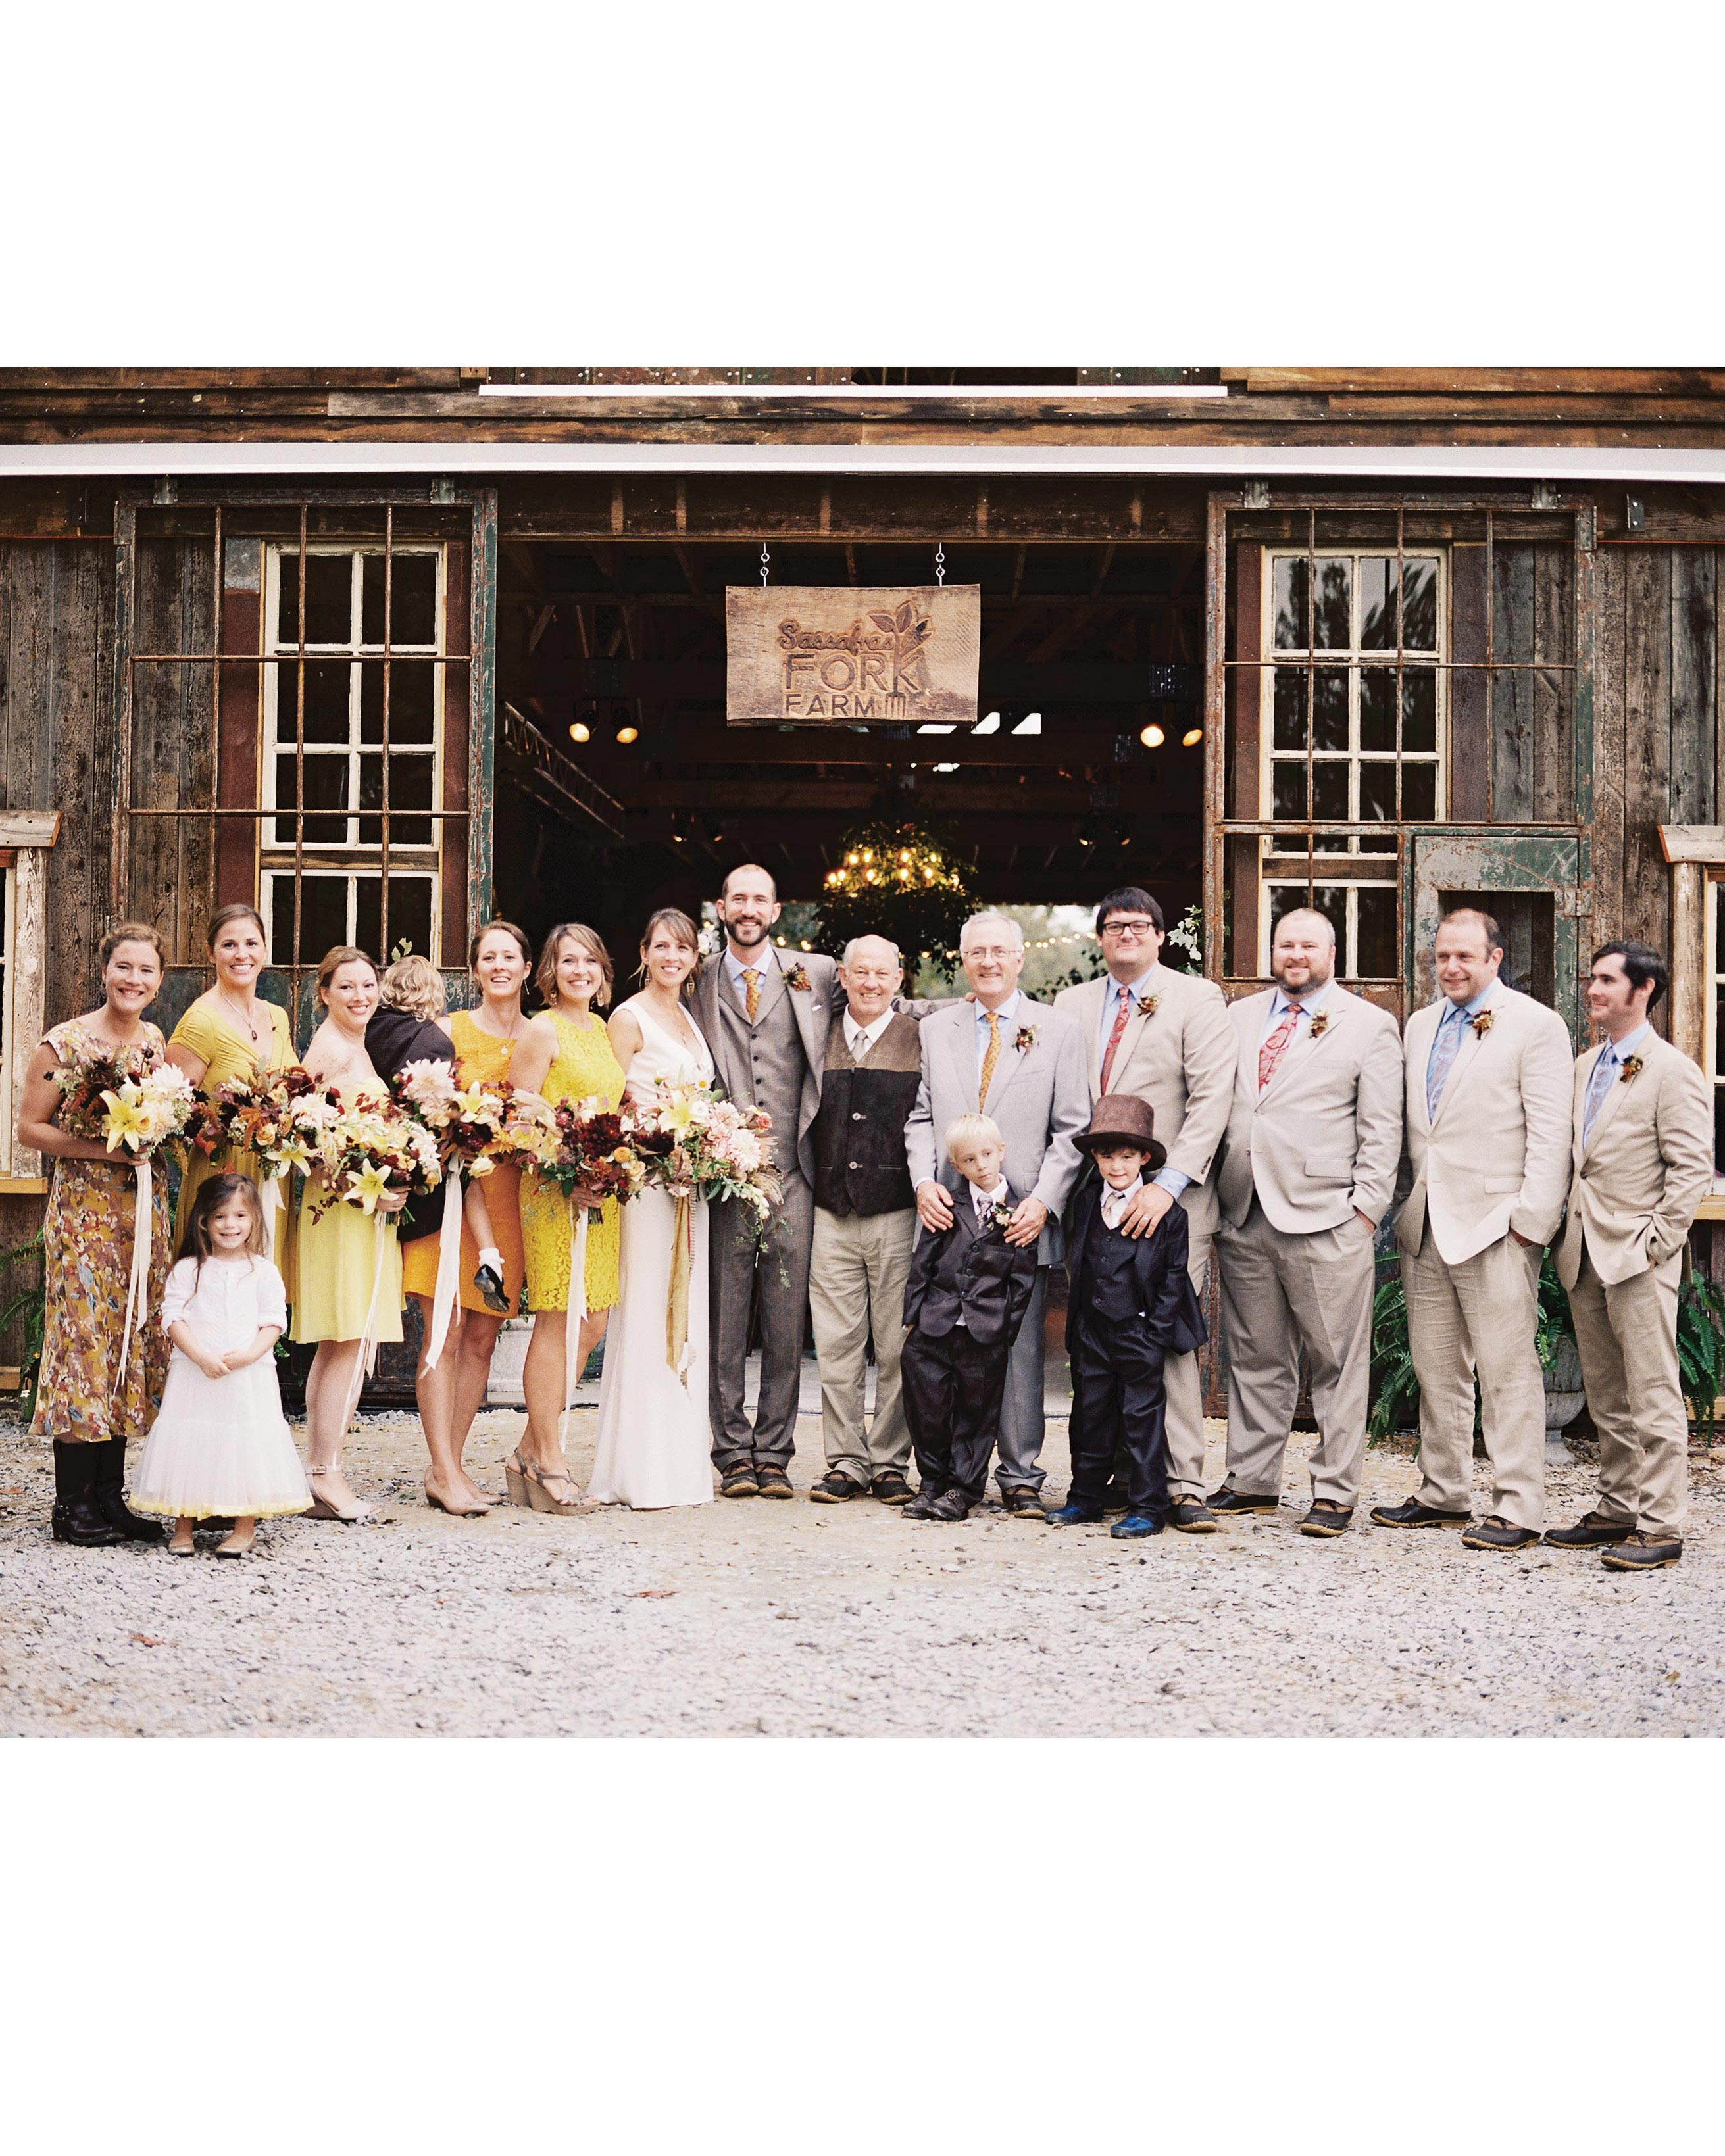 stephanie-mike-wedding-north-carolina-bridal-party-bridesmaids-groomsmen-72-s112048.jpg